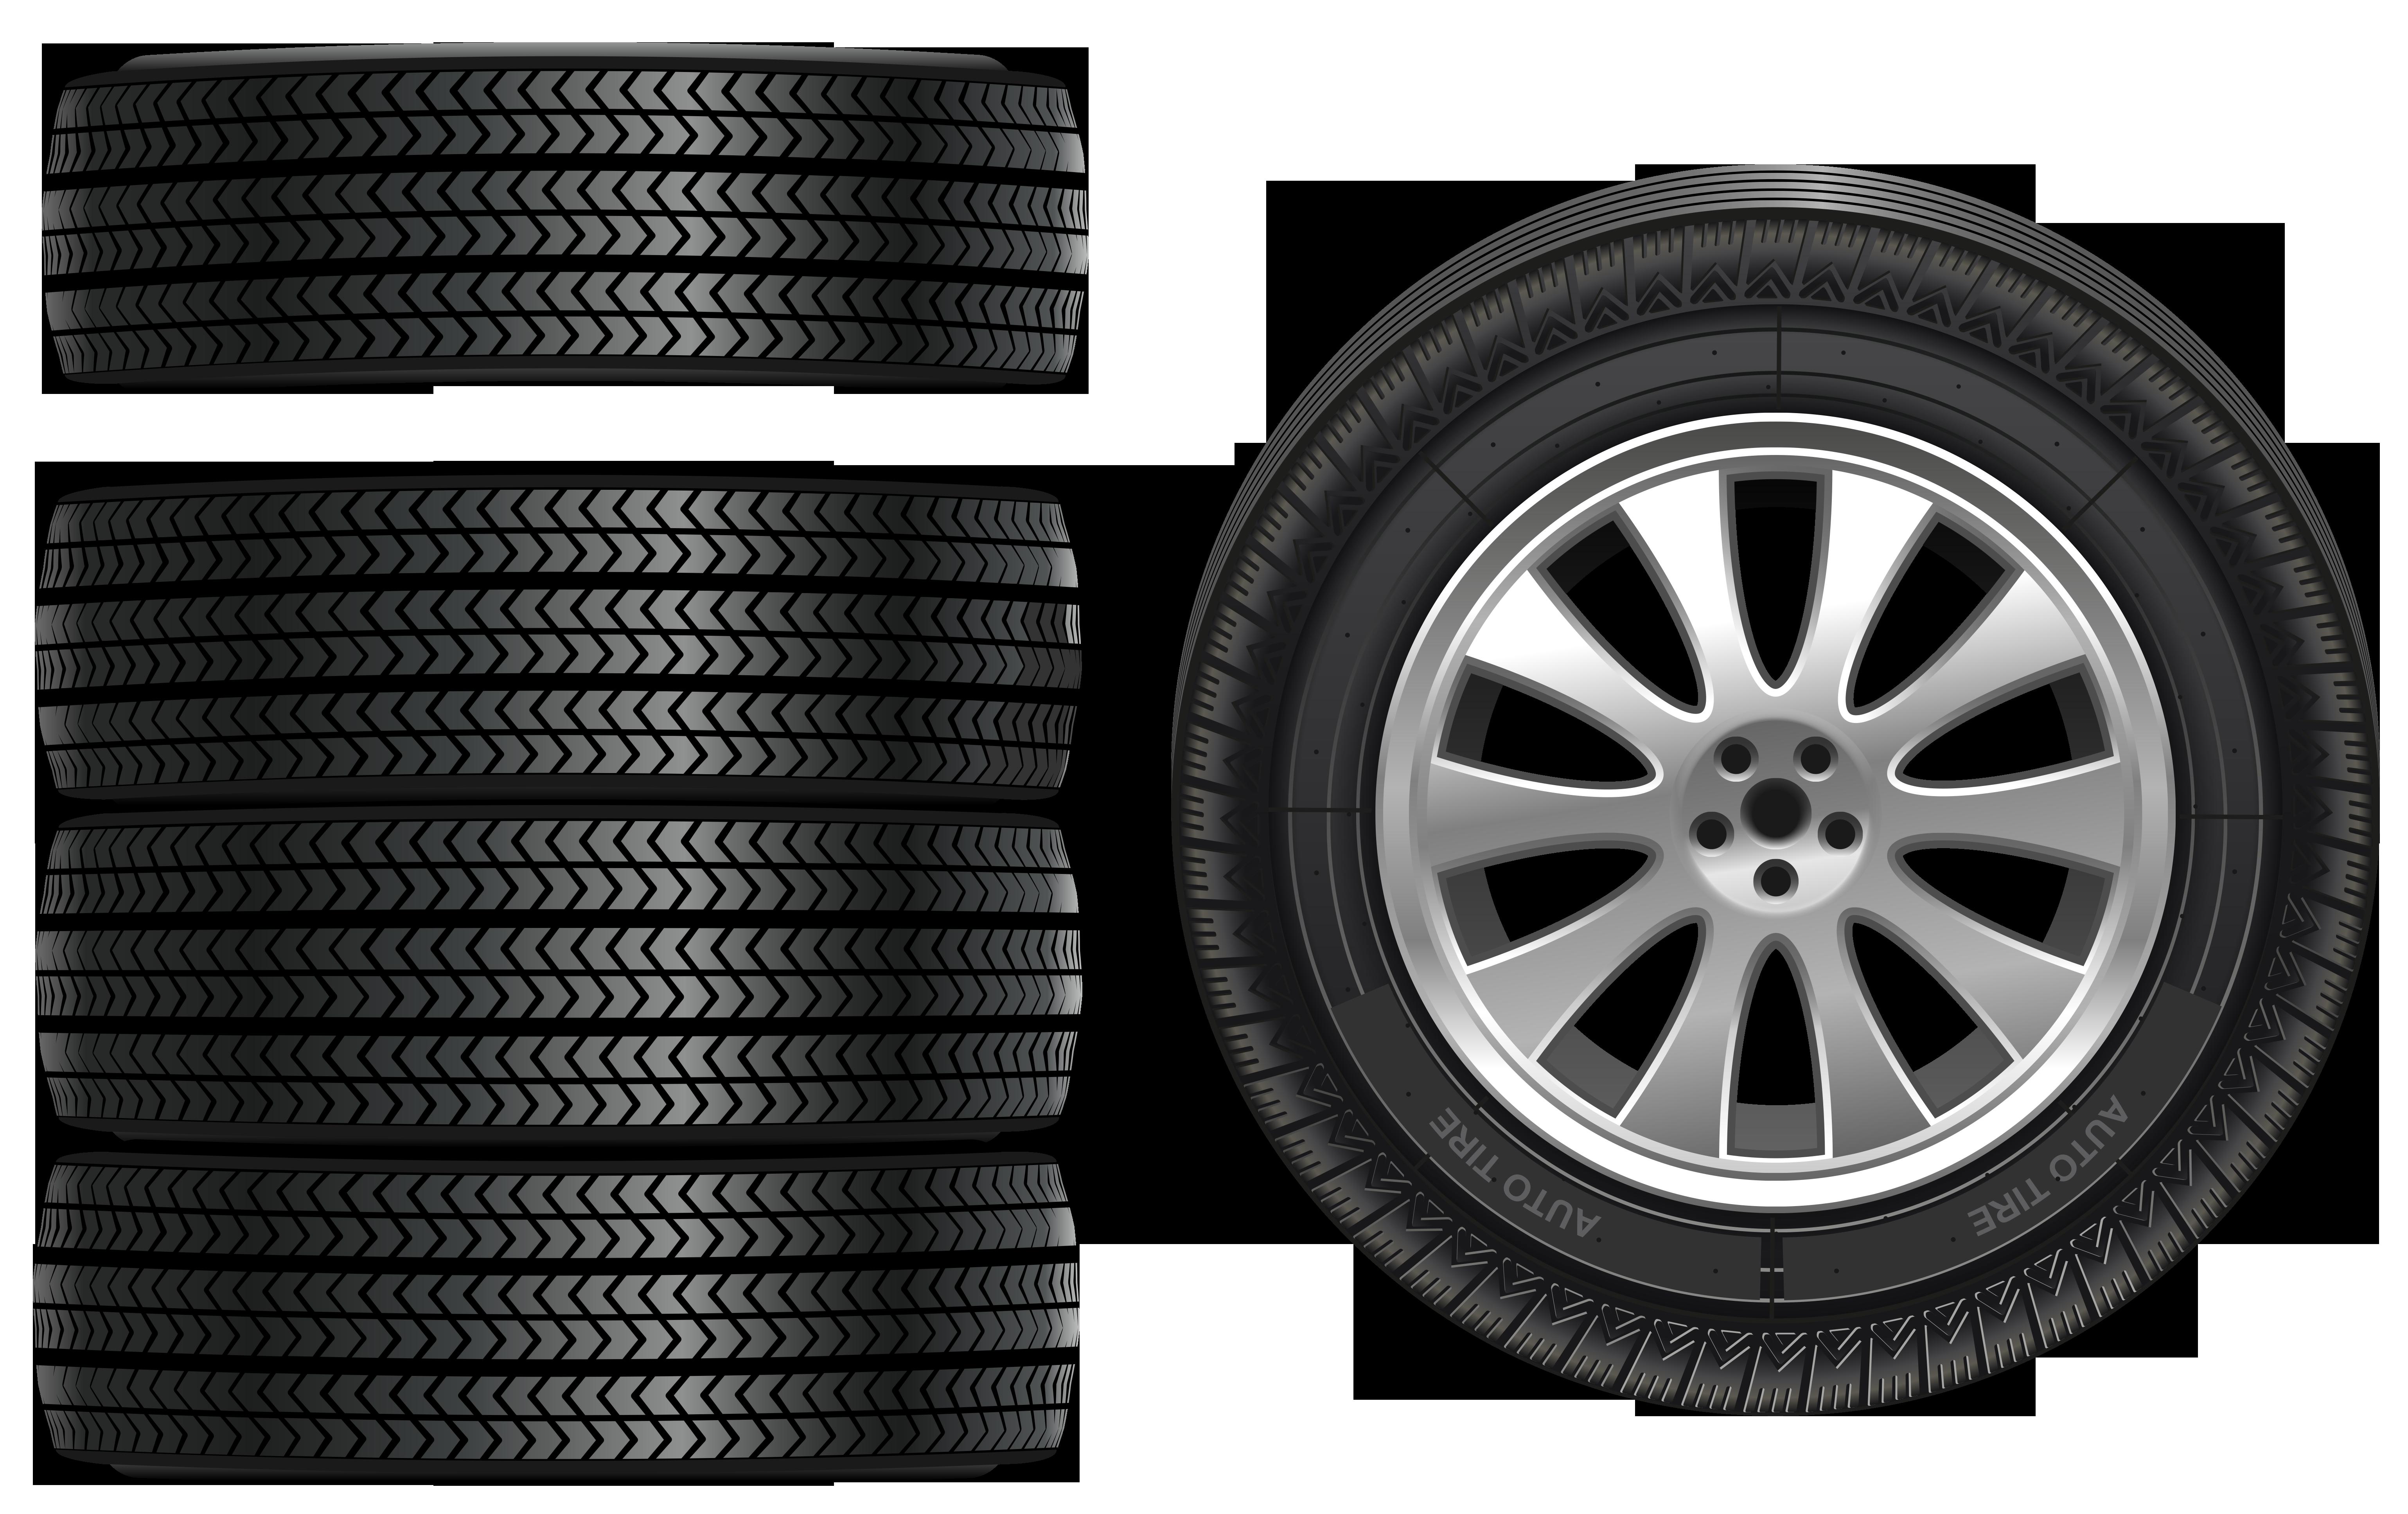 image Tires png clip art. Tire clipart